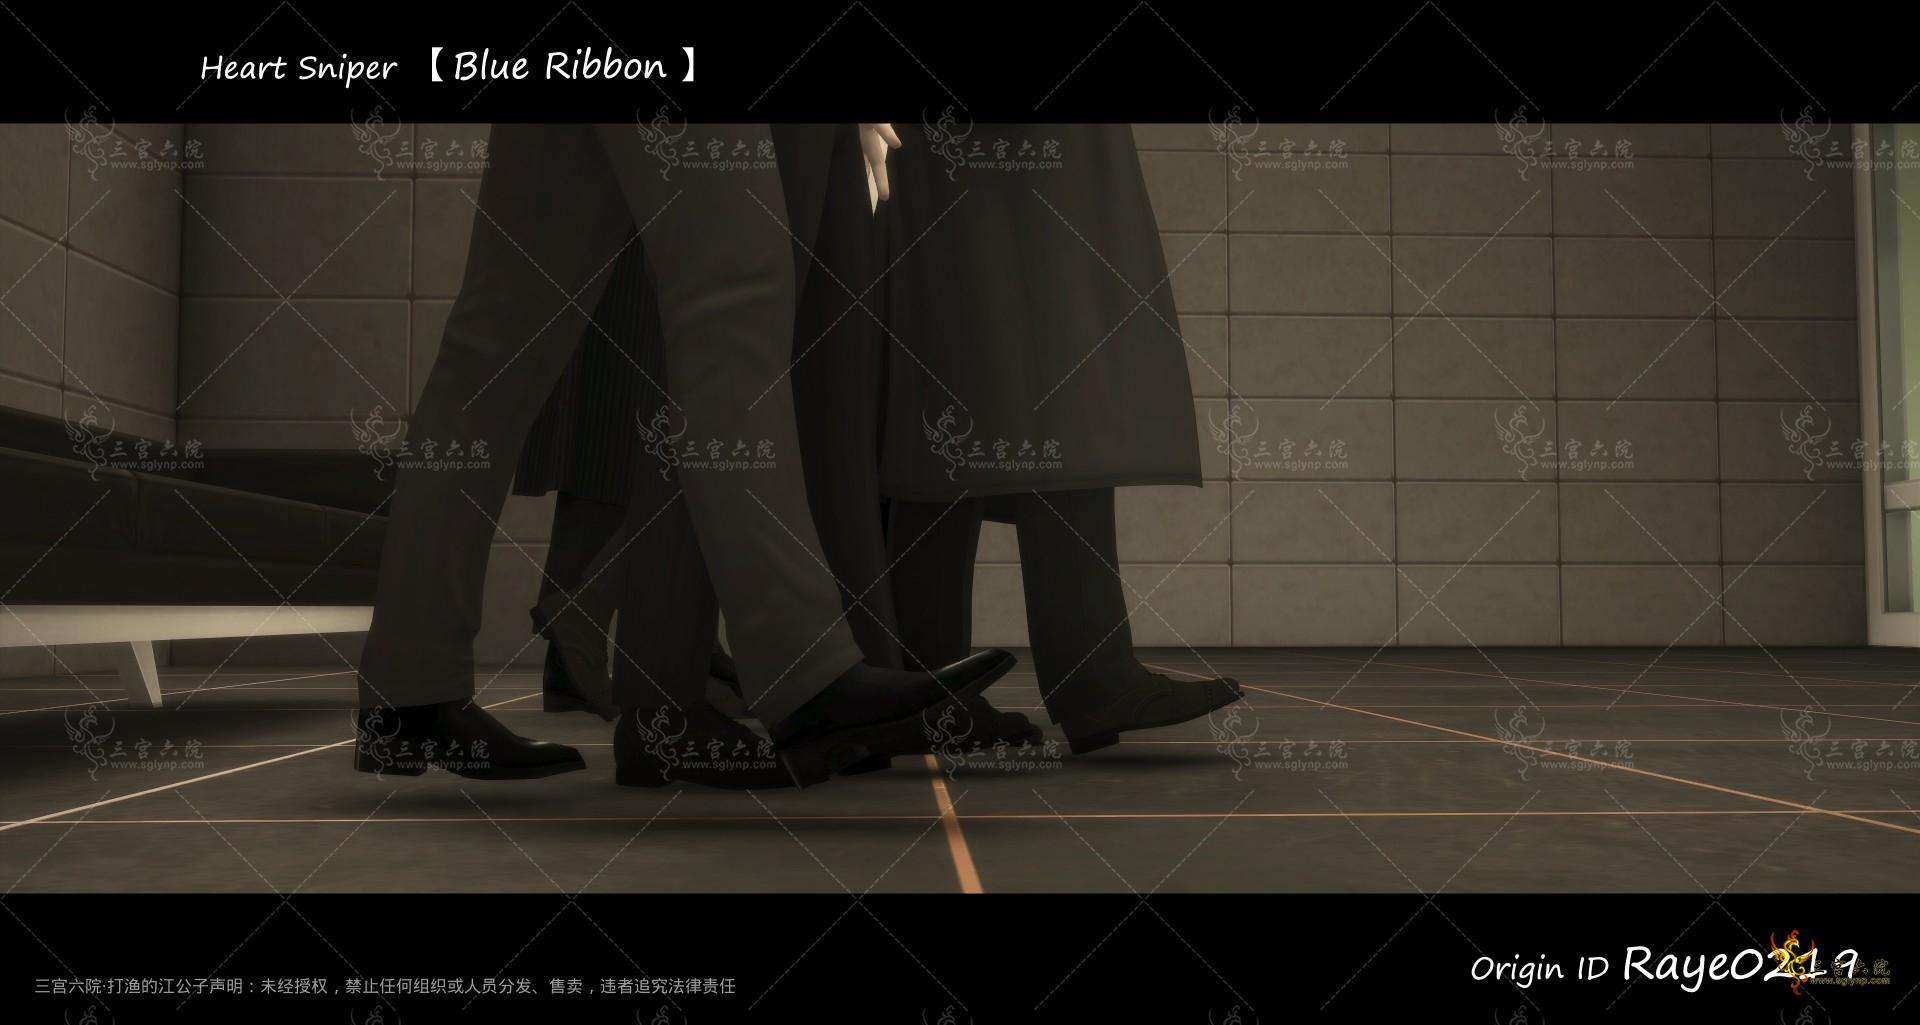 HS III [BLUE RIBBON] 06.png